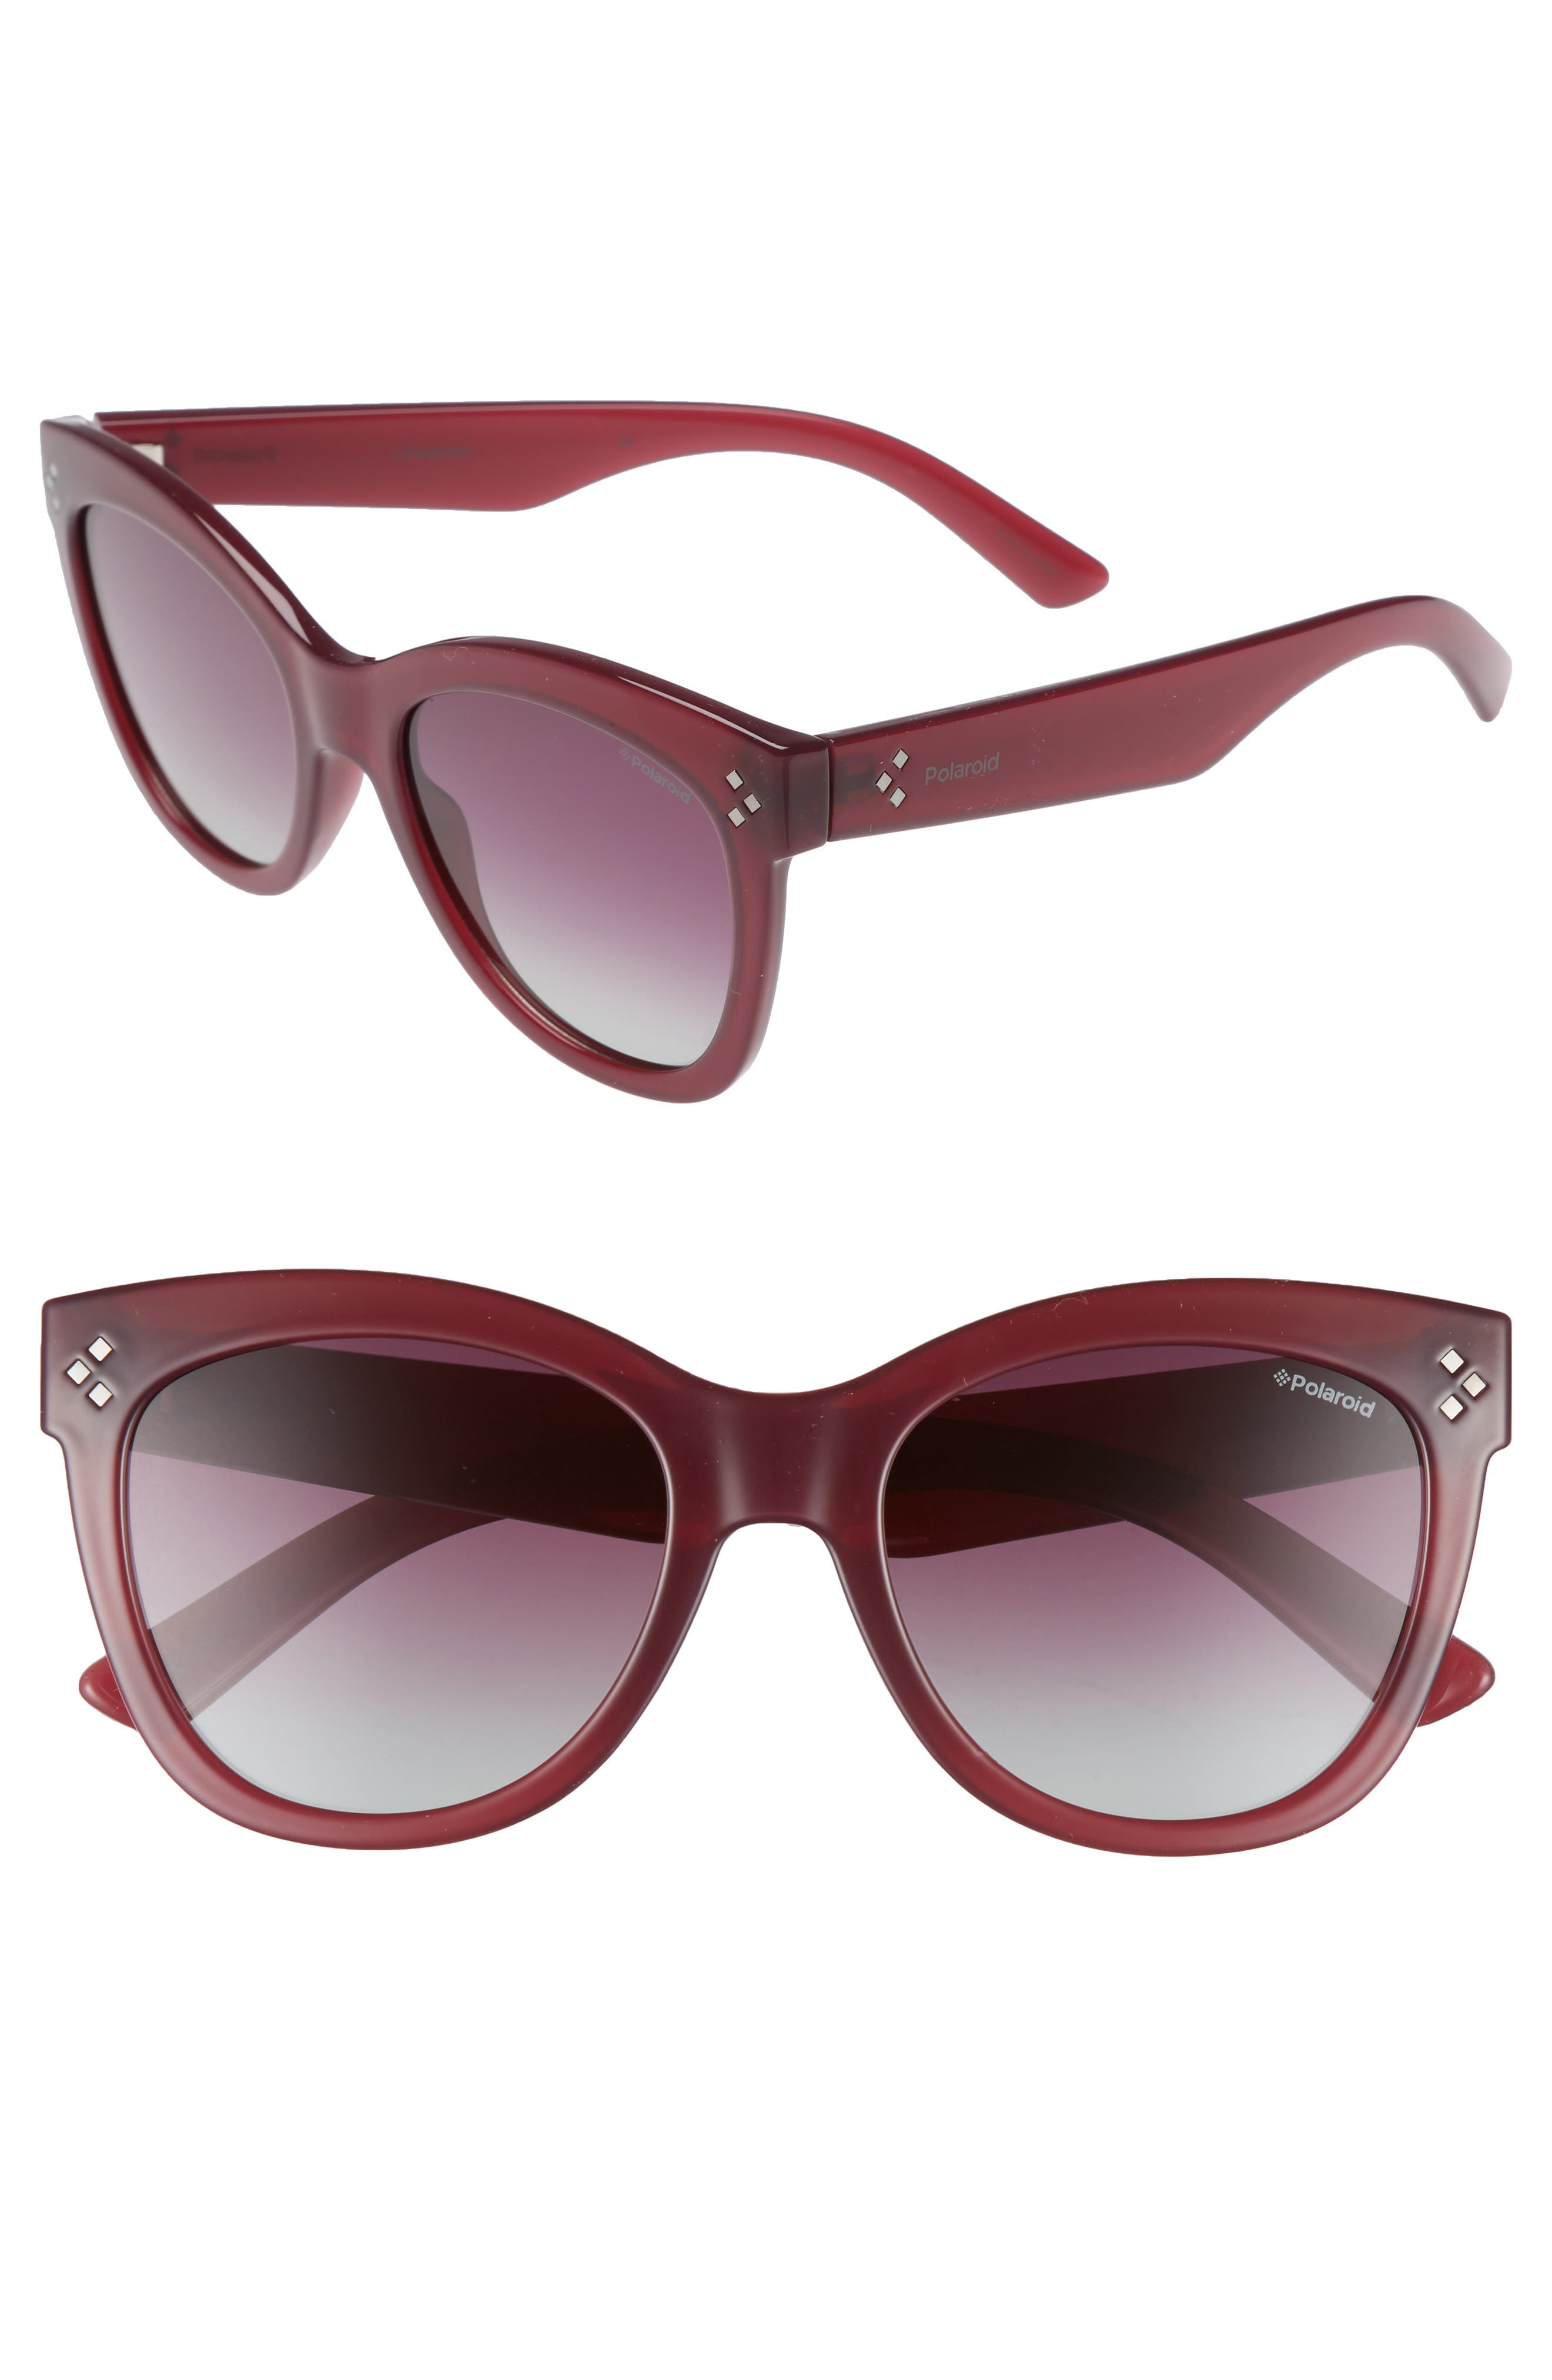 Main Image - Polaroid 54mm Polarized Sunglasses